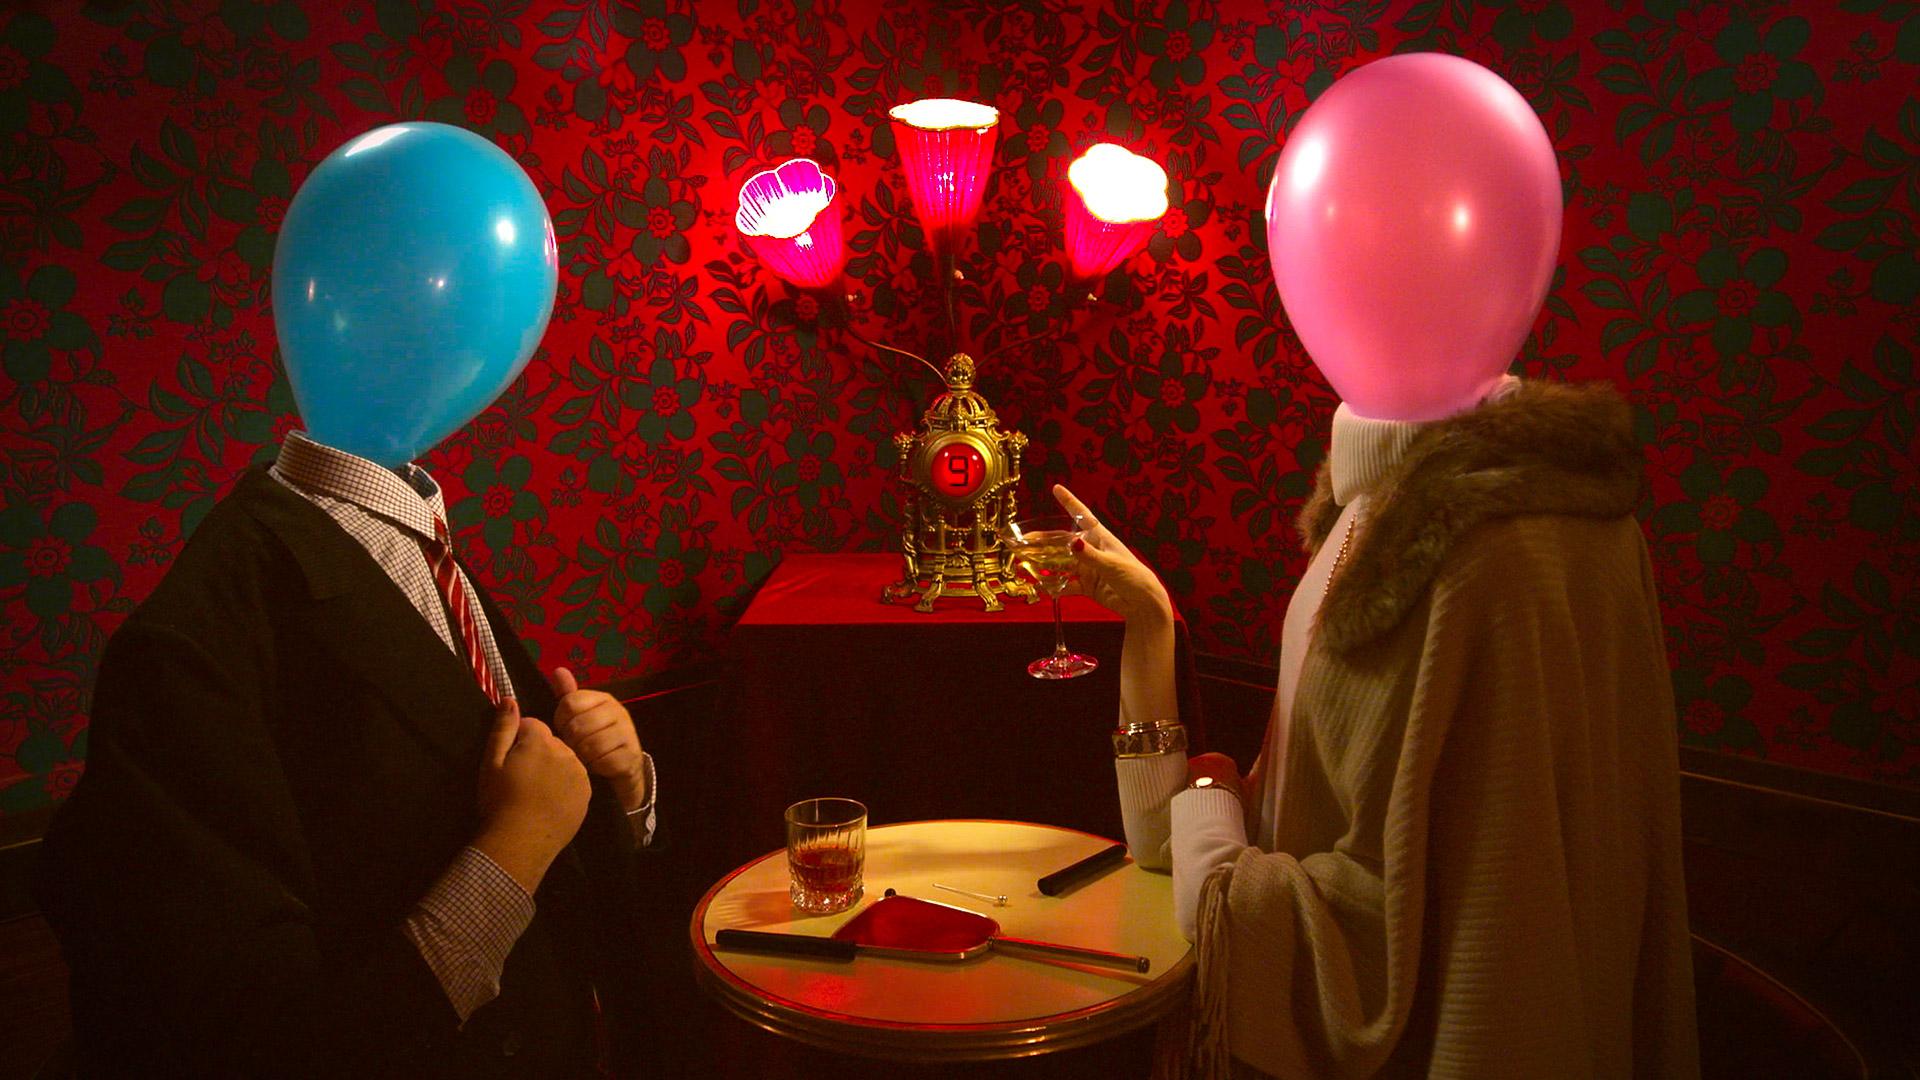 Balloon Dating